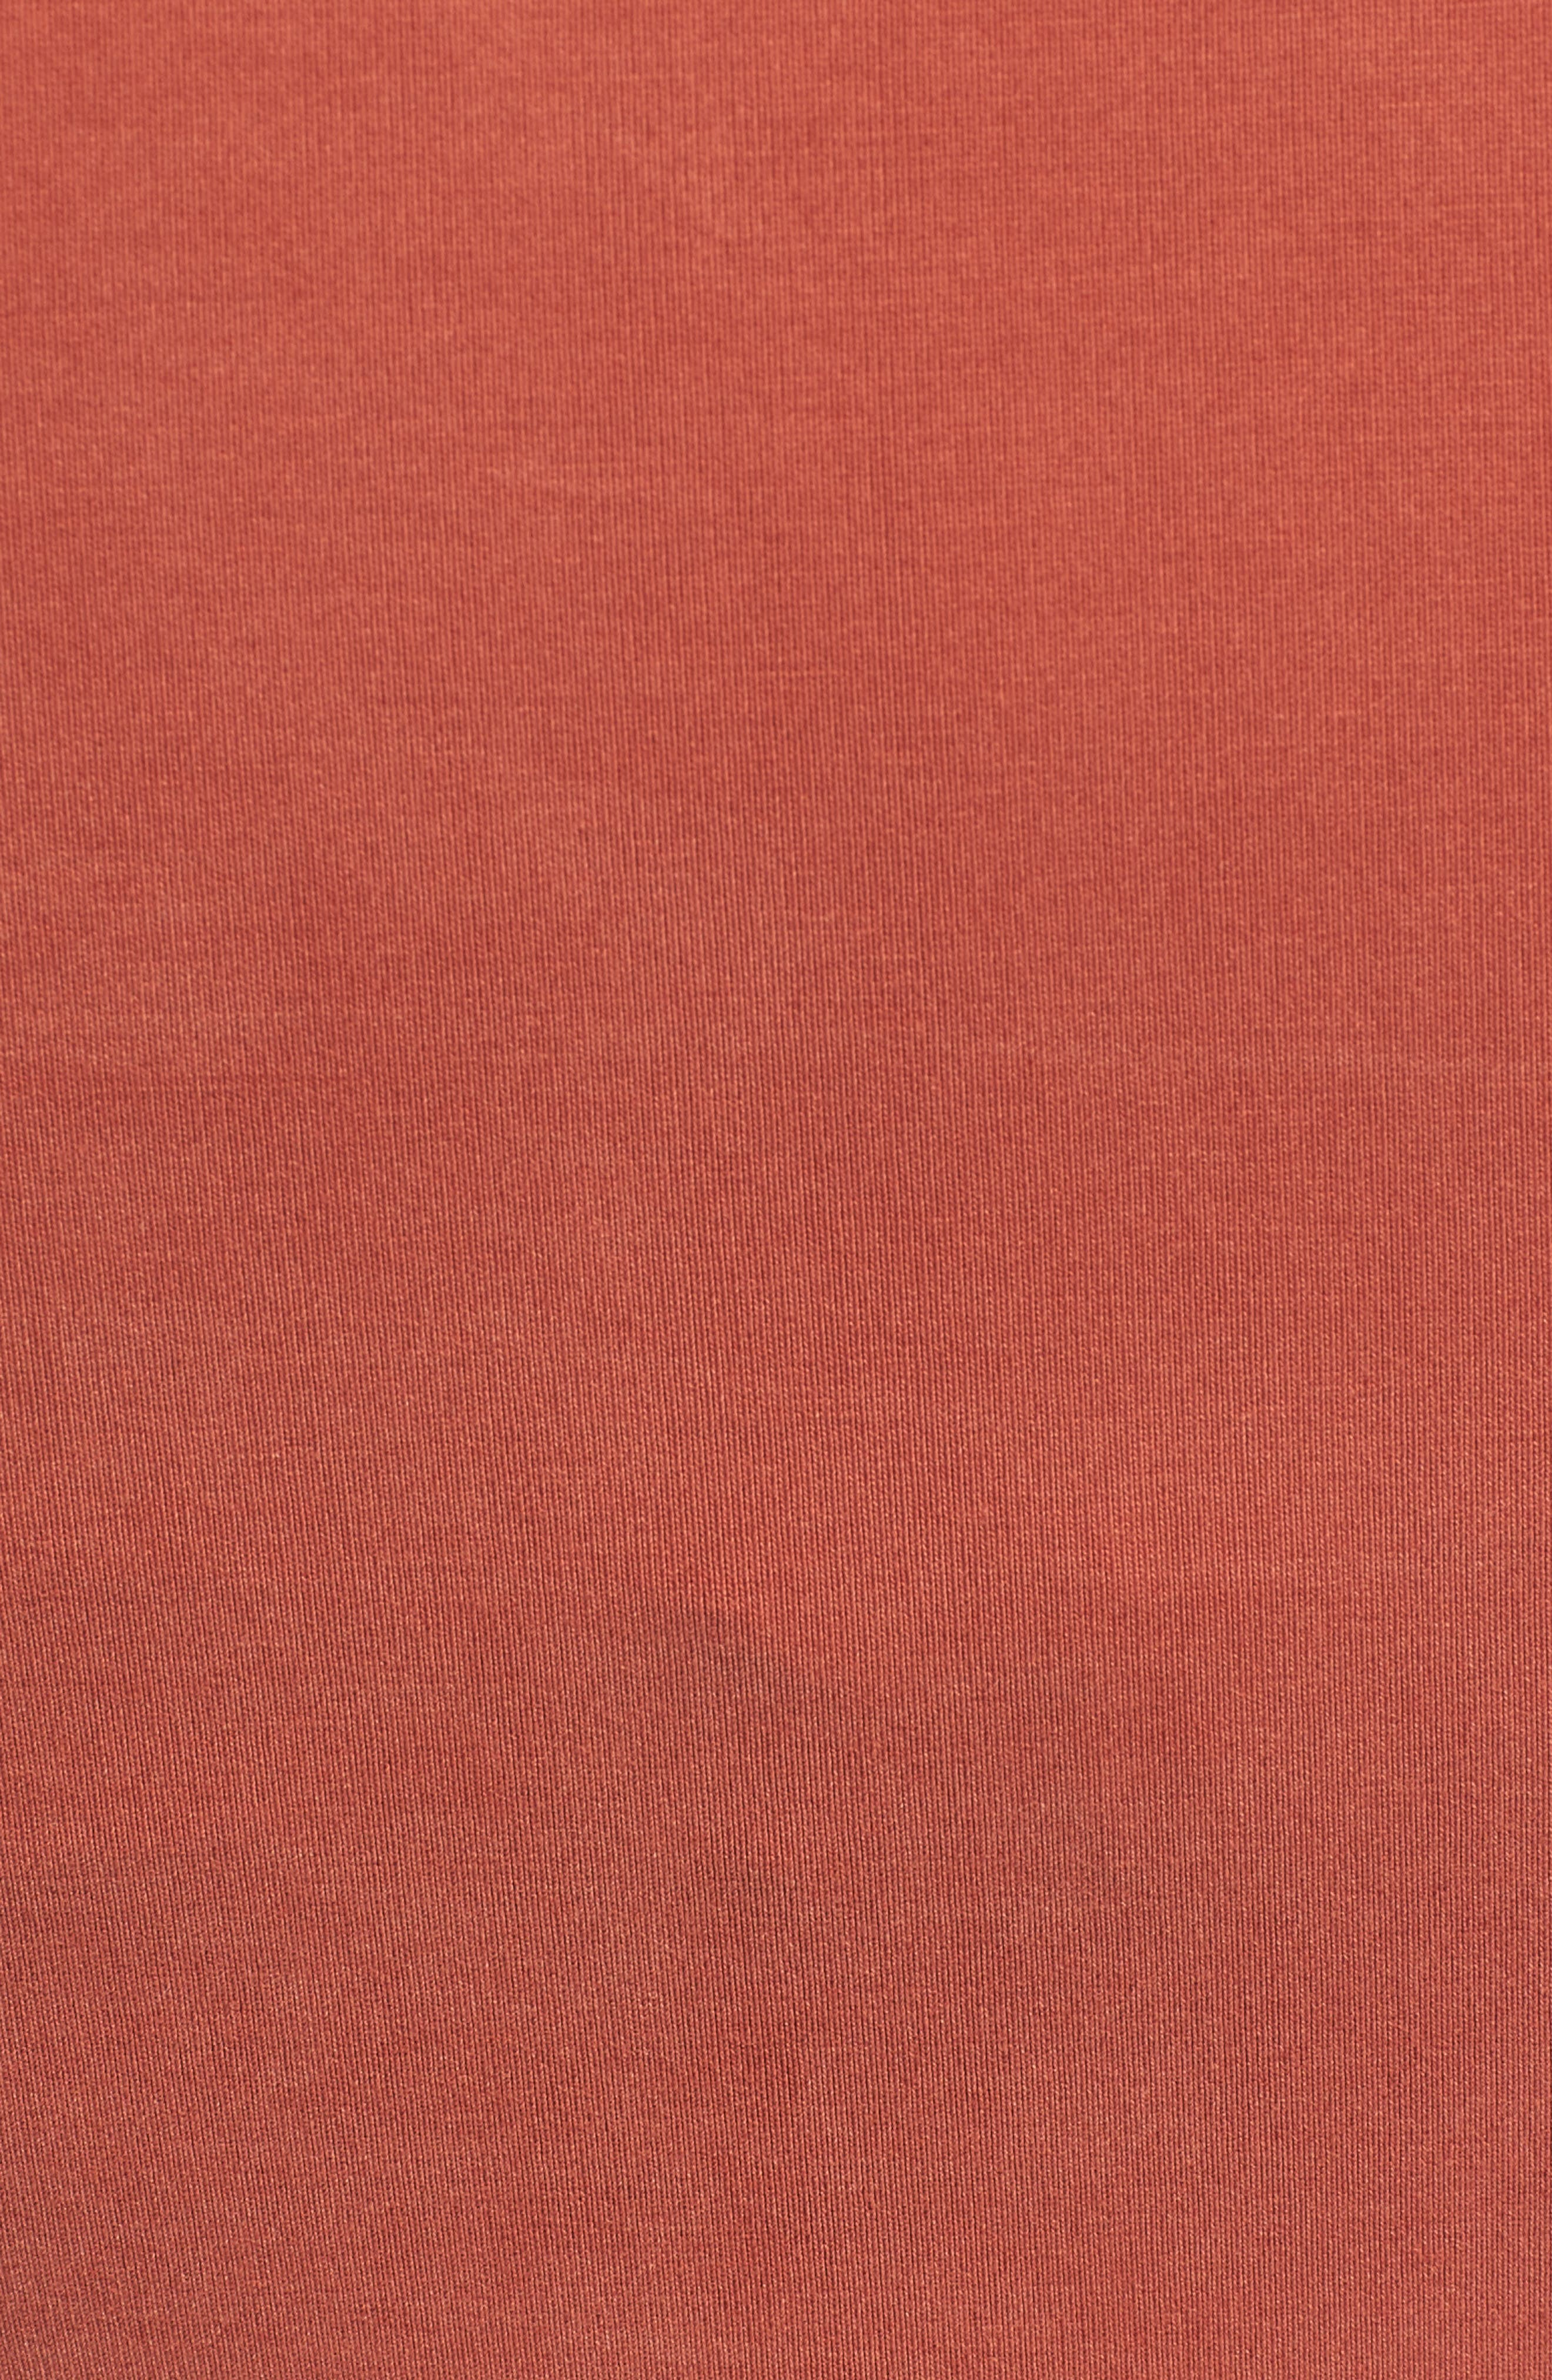 Mock Neck Tank Bodysuit,                             Alternate thumbnail 4, color,                             Rusty Torch